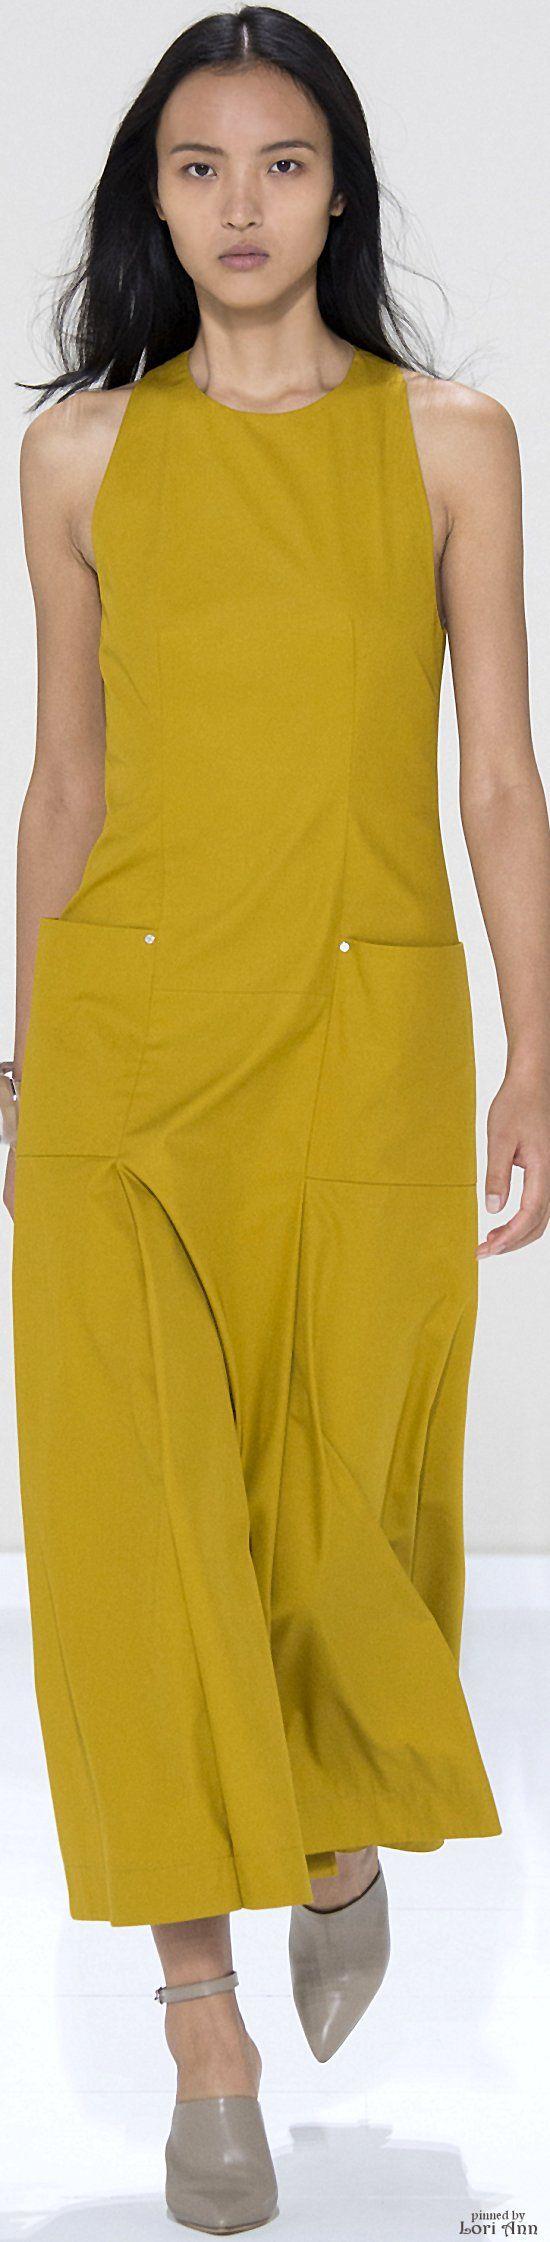 #Farbbberatung #Stilberatung #Farbenreich mit www.farben-reich.com Hermès Spring 2016 RTW